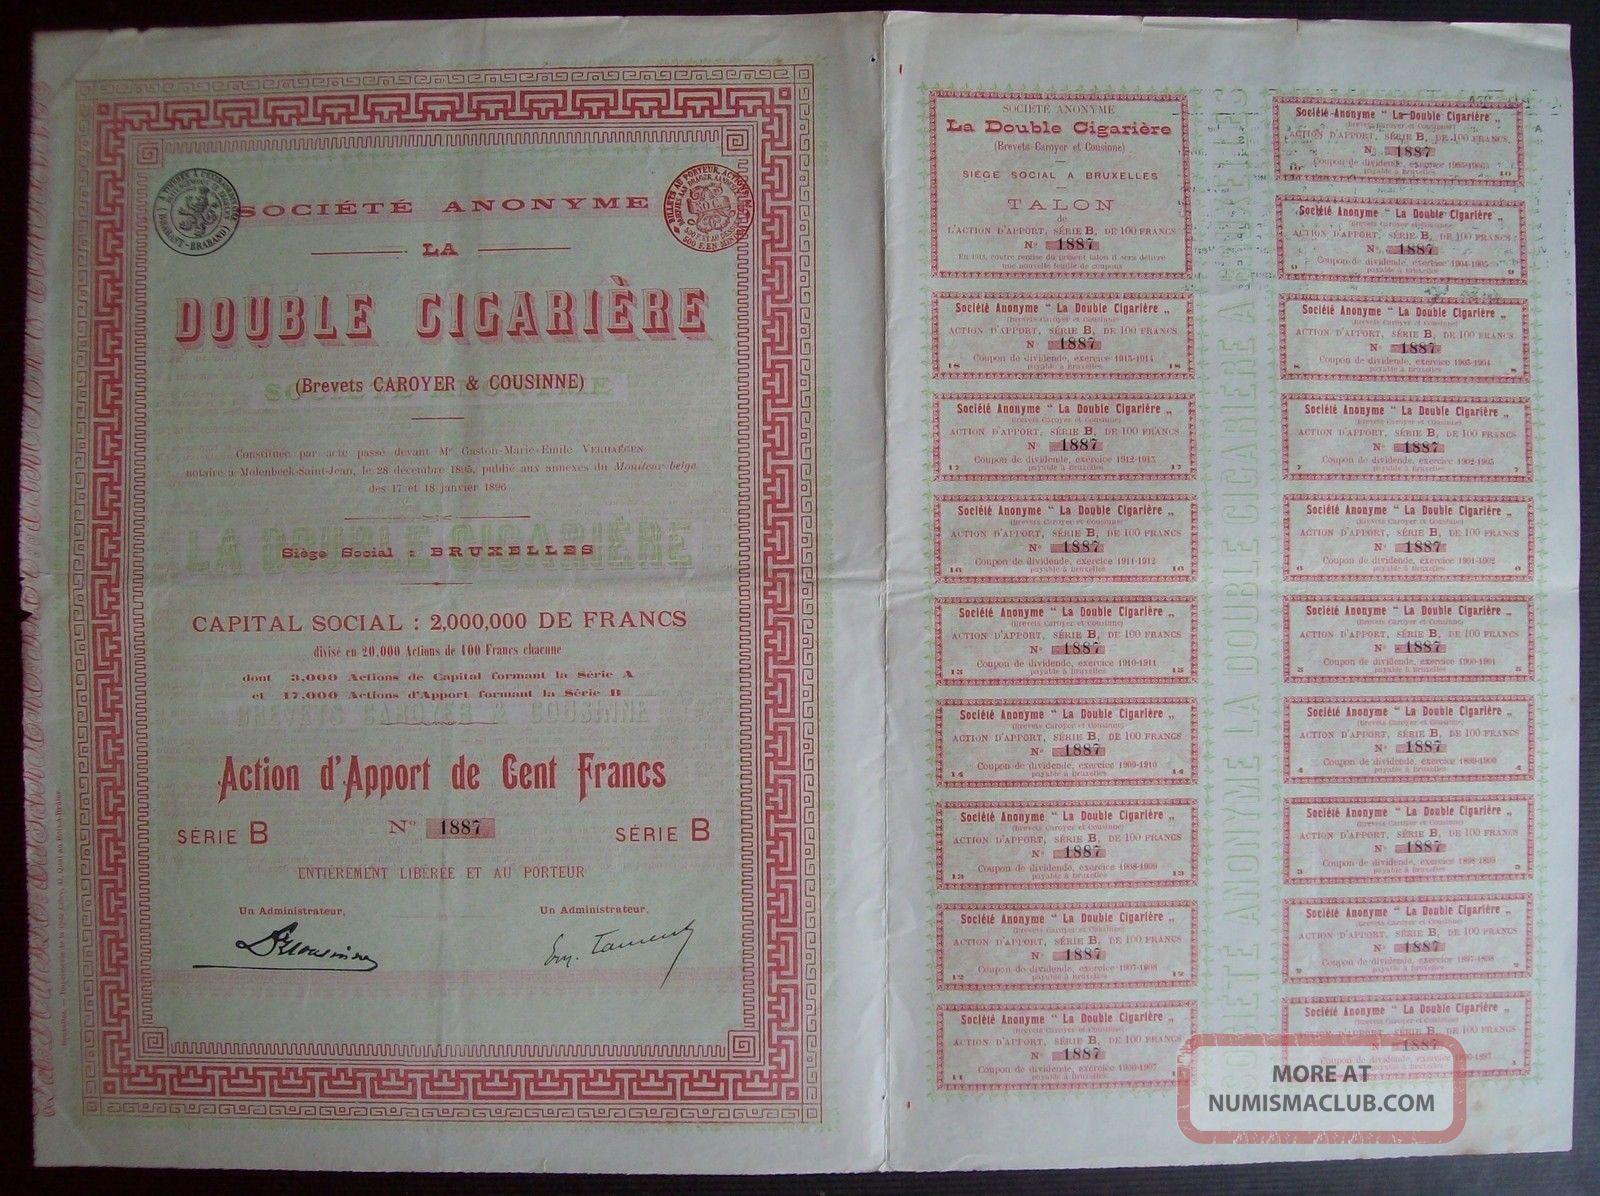 Belgium 1896 Bond - La Double Cigariere Bruxelles - With Coupons. .  A9765 World photo